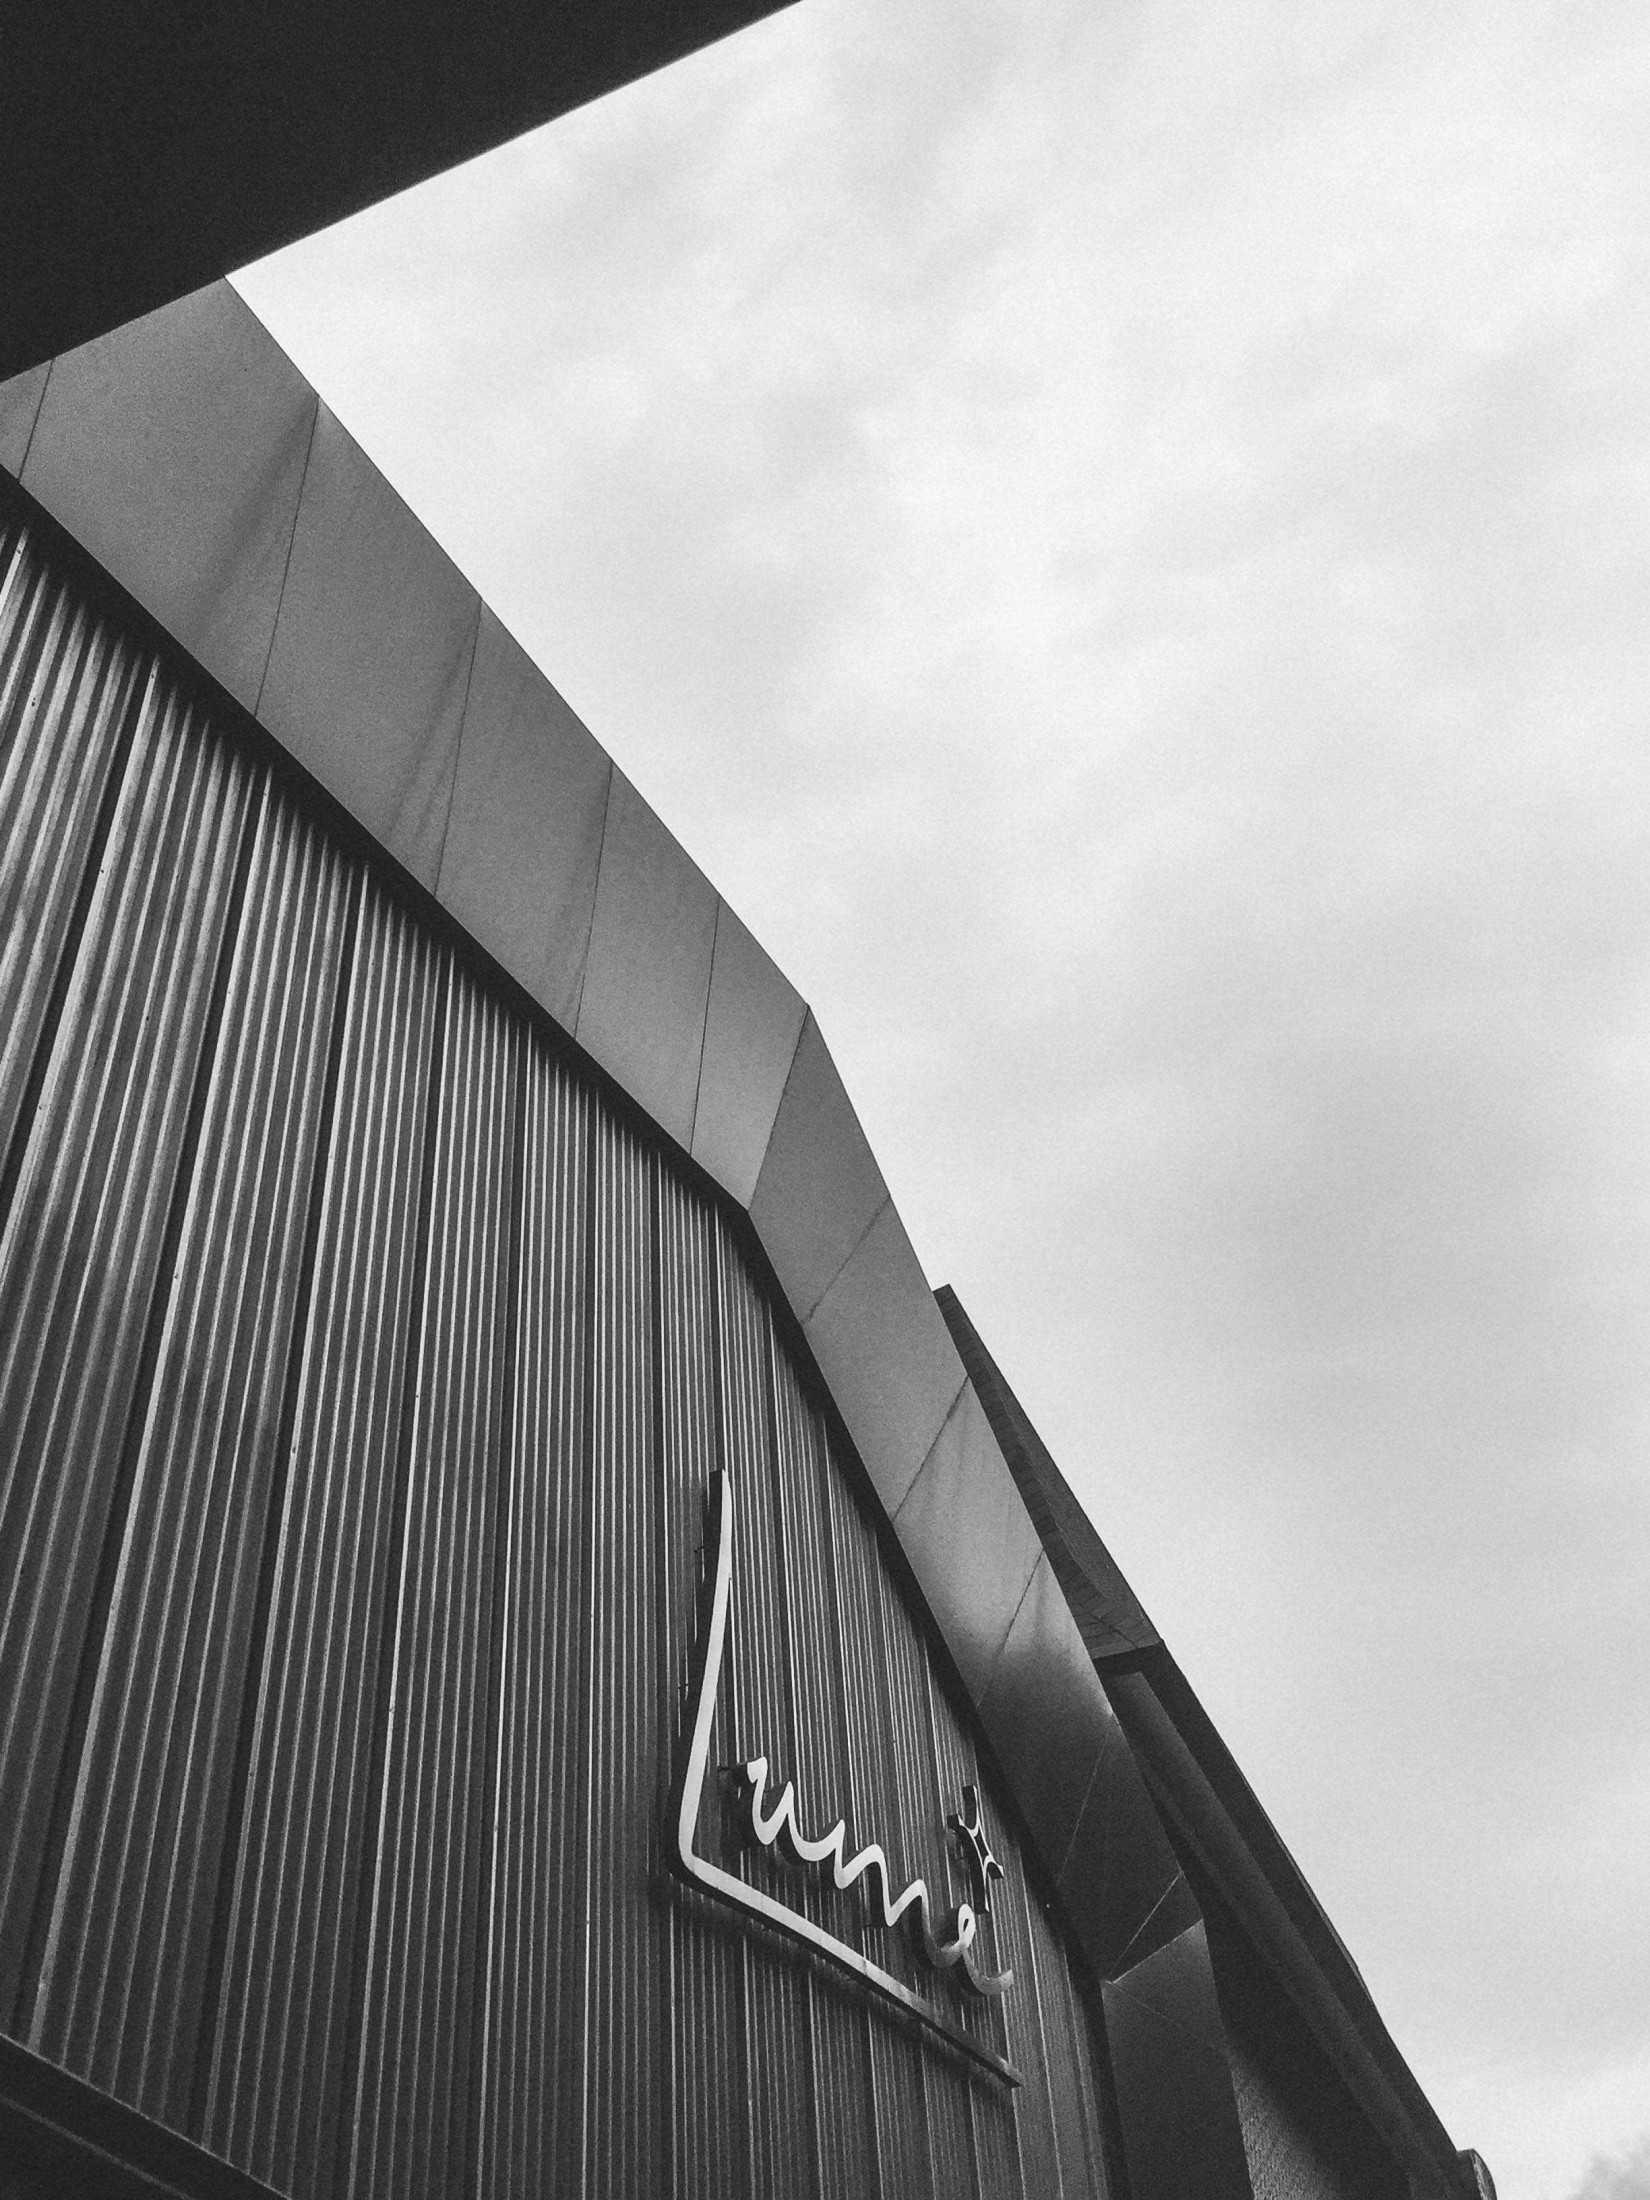 Studio Tana Lume Restaurant Jakarta, Daerah Khusus Ibukota Jakarta, Indonesia Jakarta, Daerah Khusus Ibukota Jakarta, Indonesia Studio-Tana-Lume-Restaurant  79598